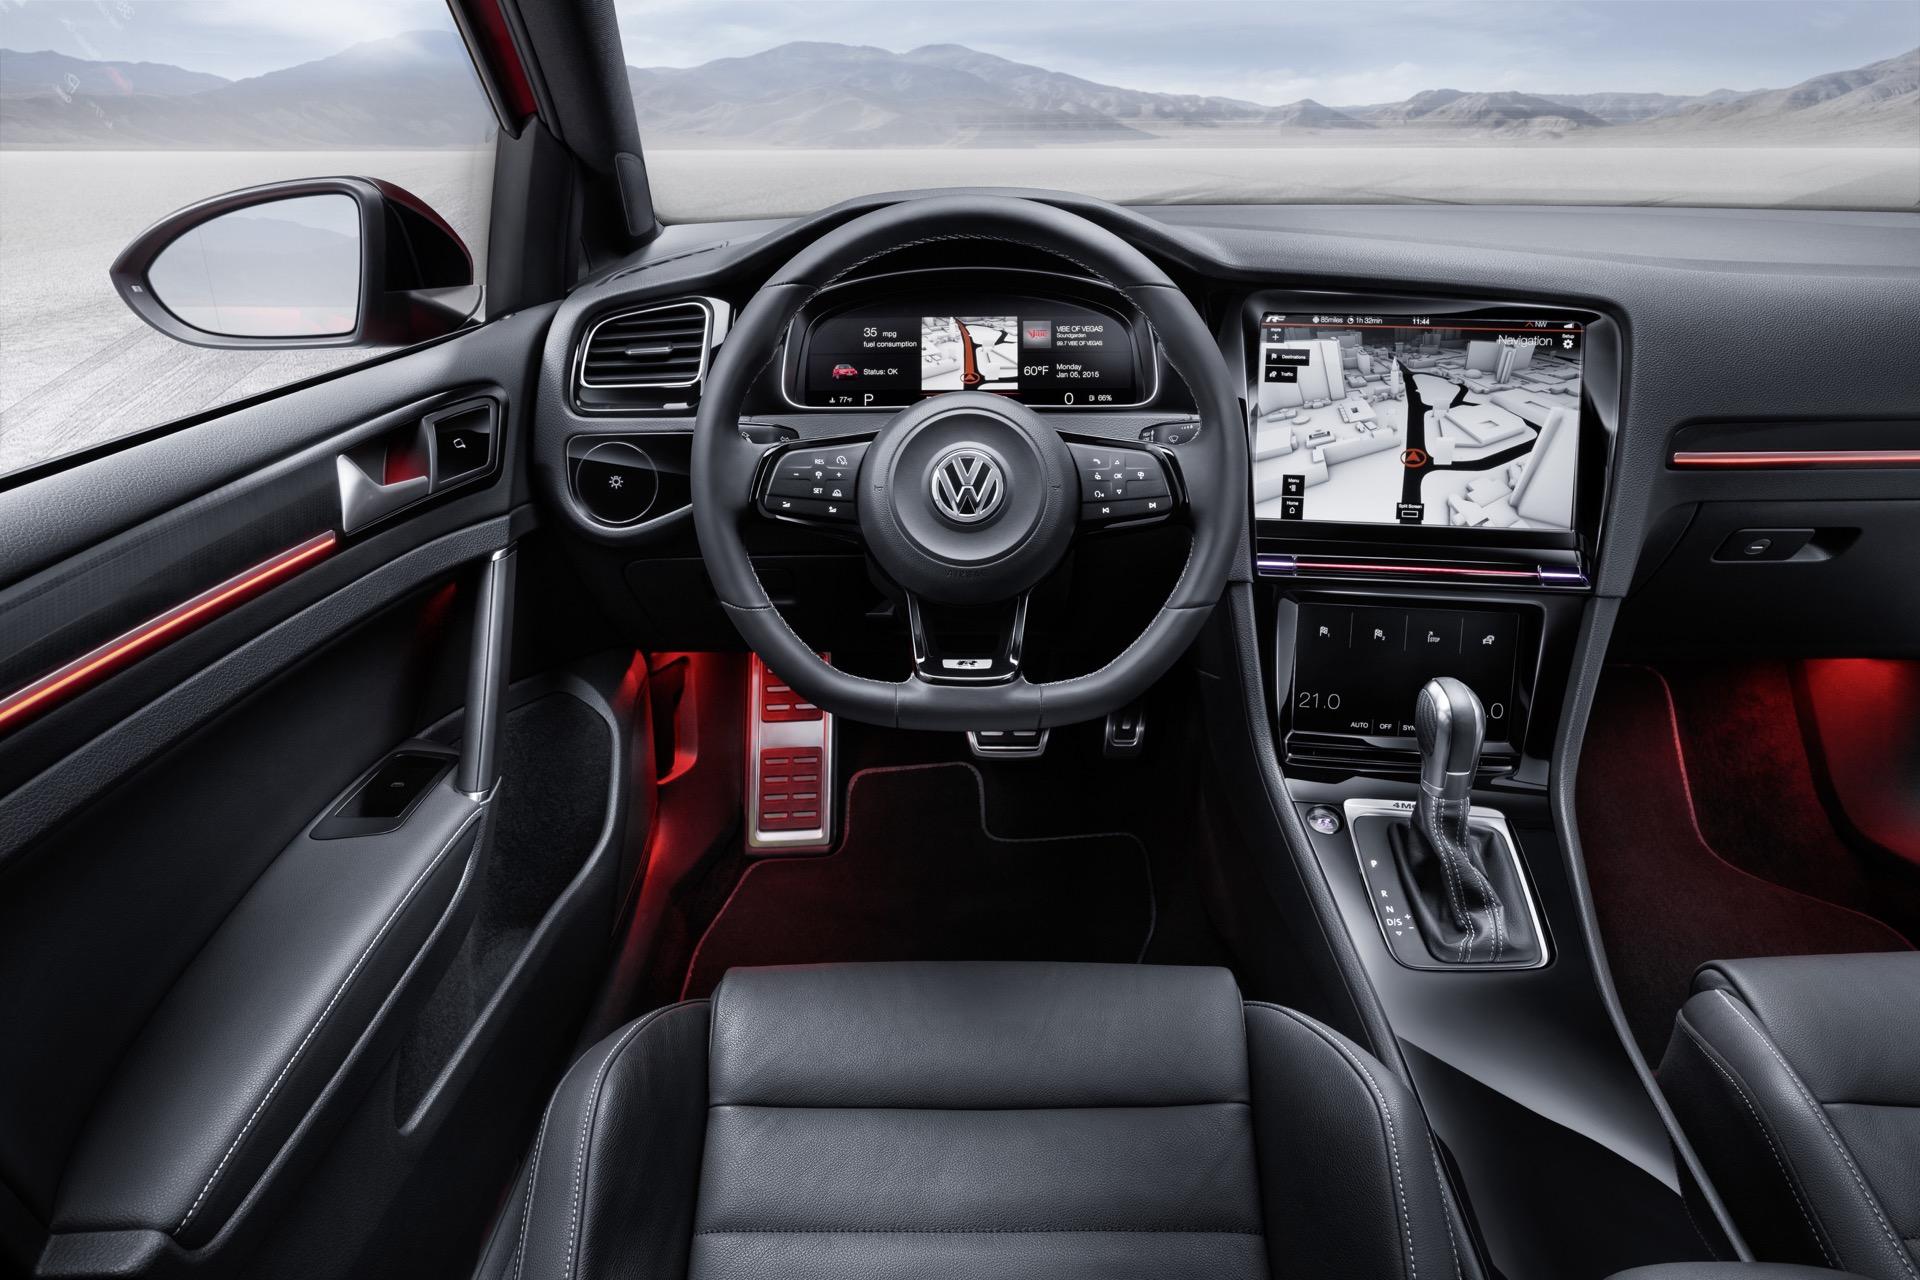 VW Golf R Concept Previews Next-Gen Interface, Gesture Controls